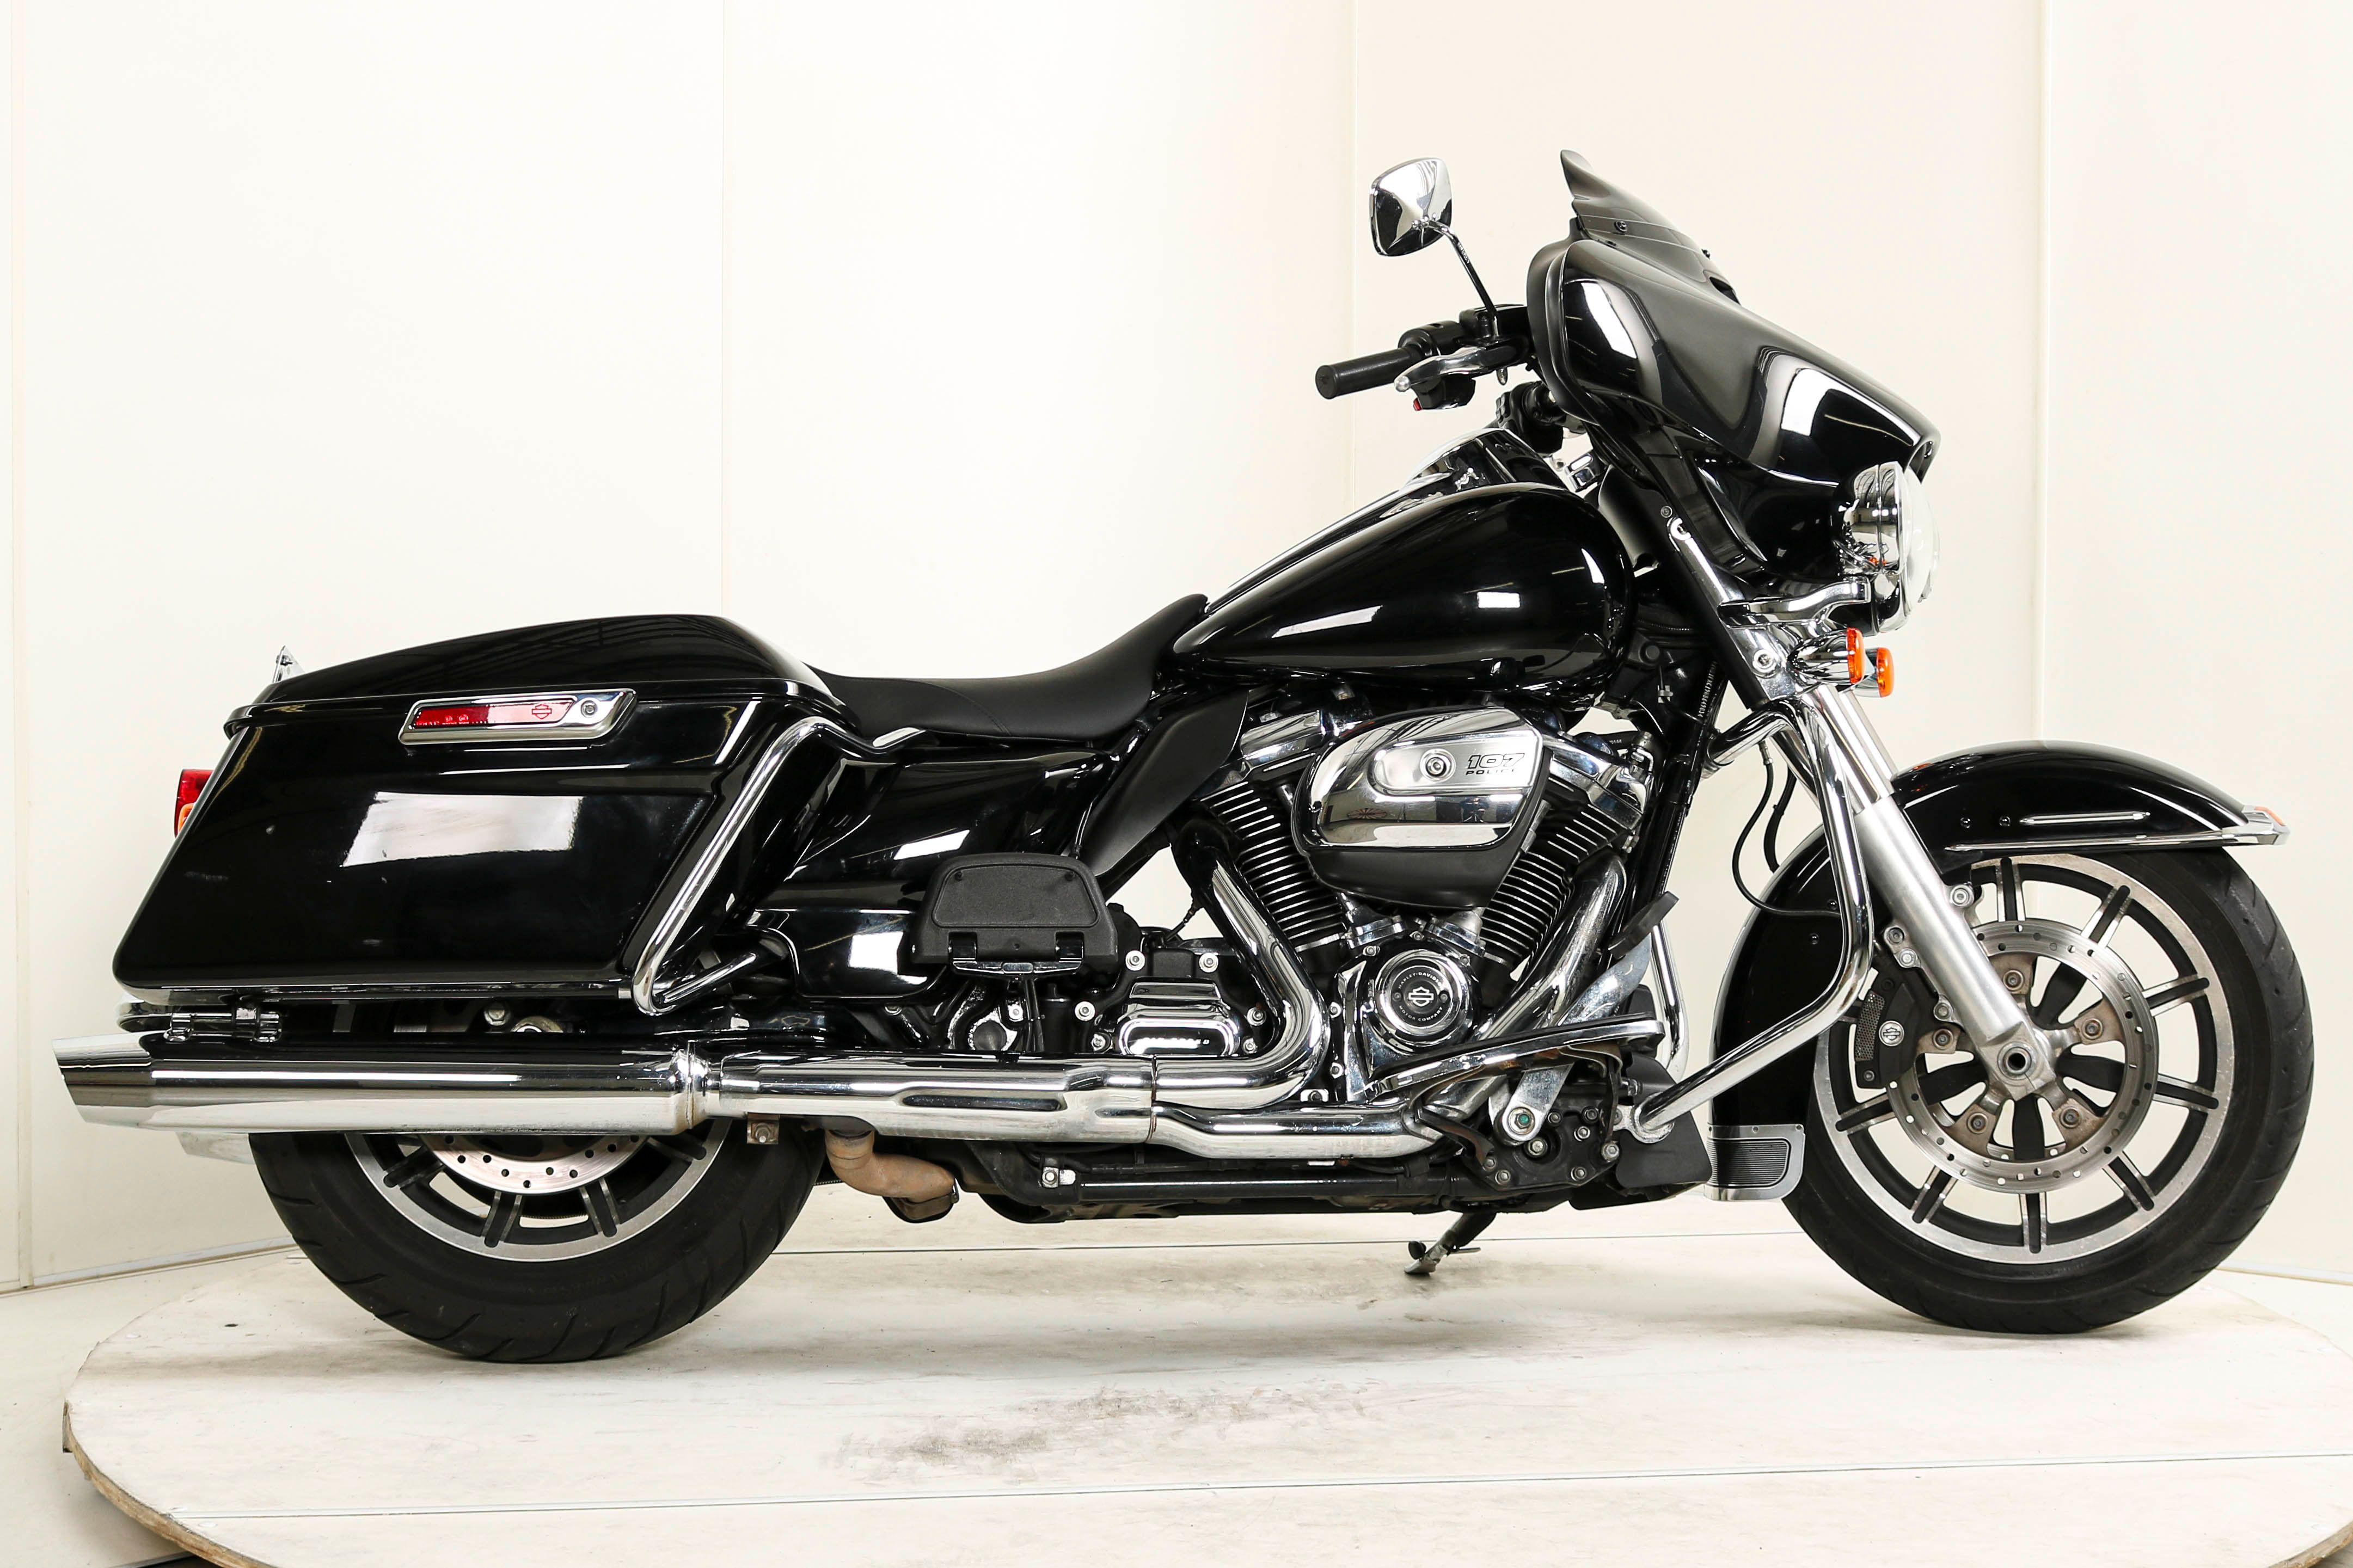 2017 Harley-Davidson Electra Glide Police